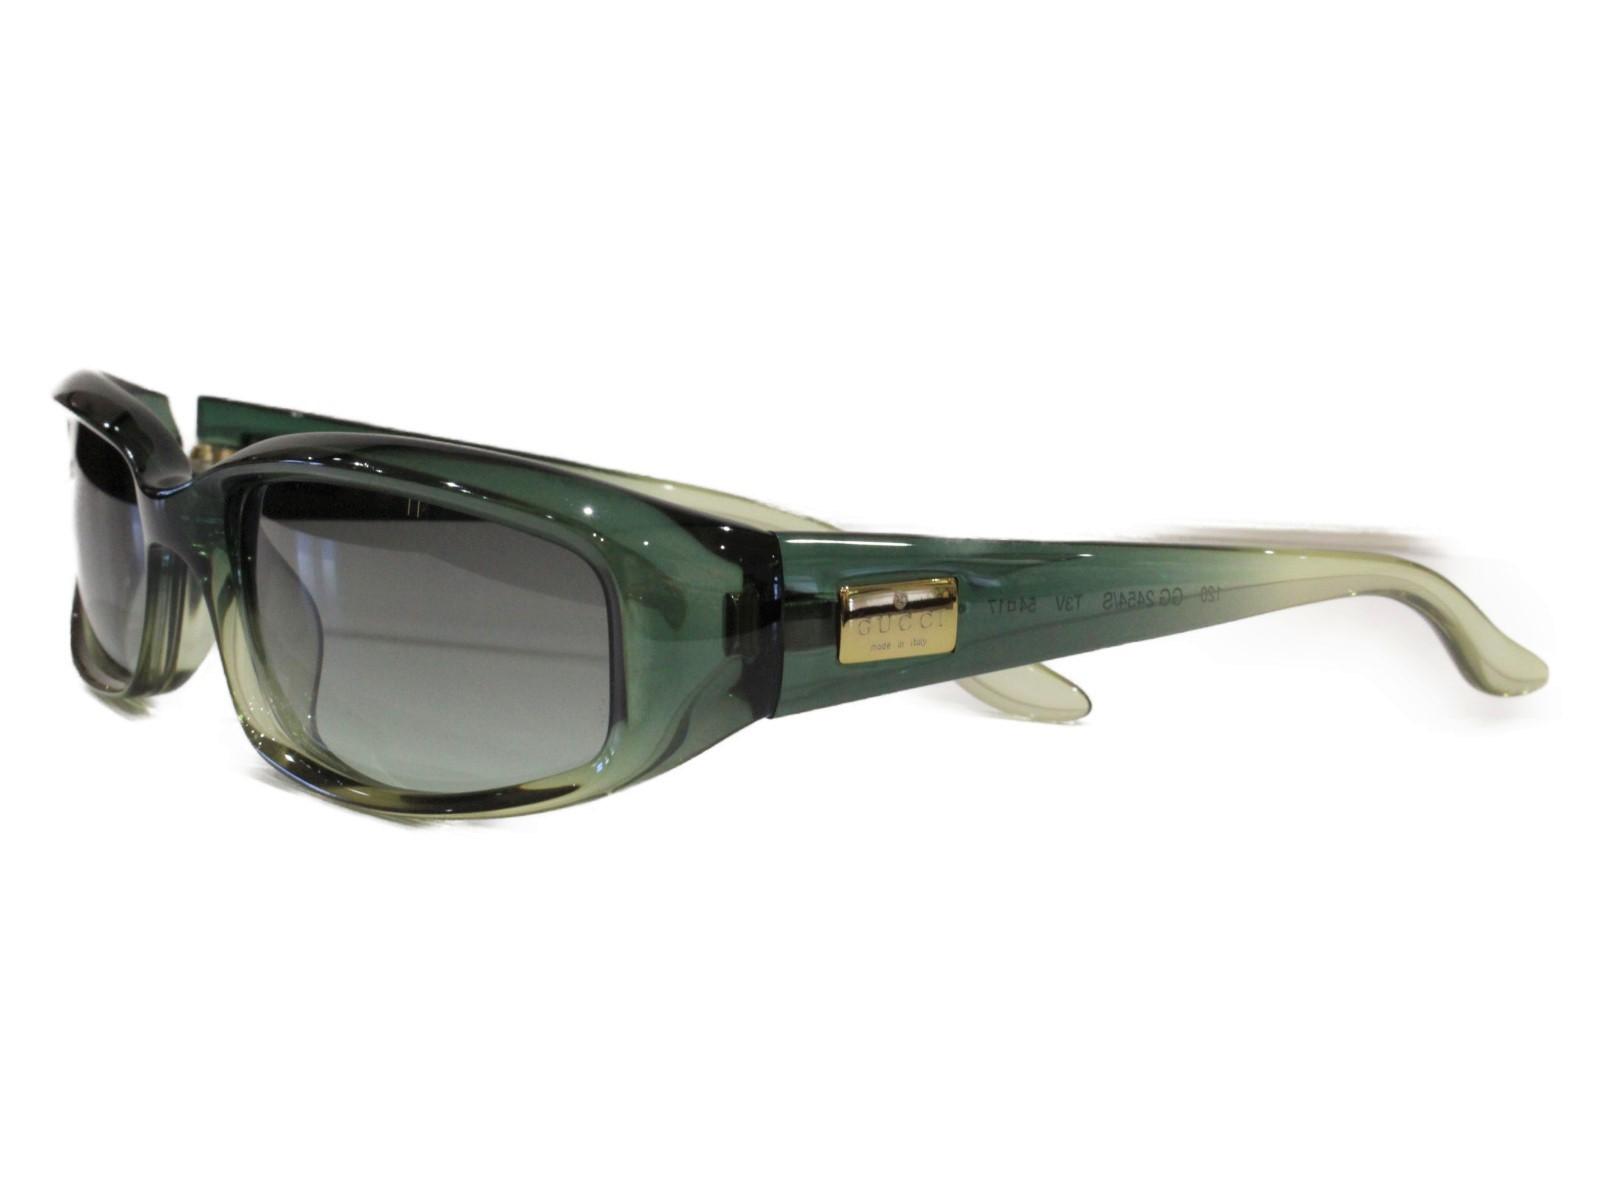 Gucci グッチ レディース サングラス 小物 GG2454/S ダークグリーン系 プラスチック 眼鏡 レディース ユニセックス メンズ ウィメンズ 眼鏡 かっこいい 小物 紳士 幅広【中古】, ミサトシ:438e3bf9 --- officewill.xsrv.jp